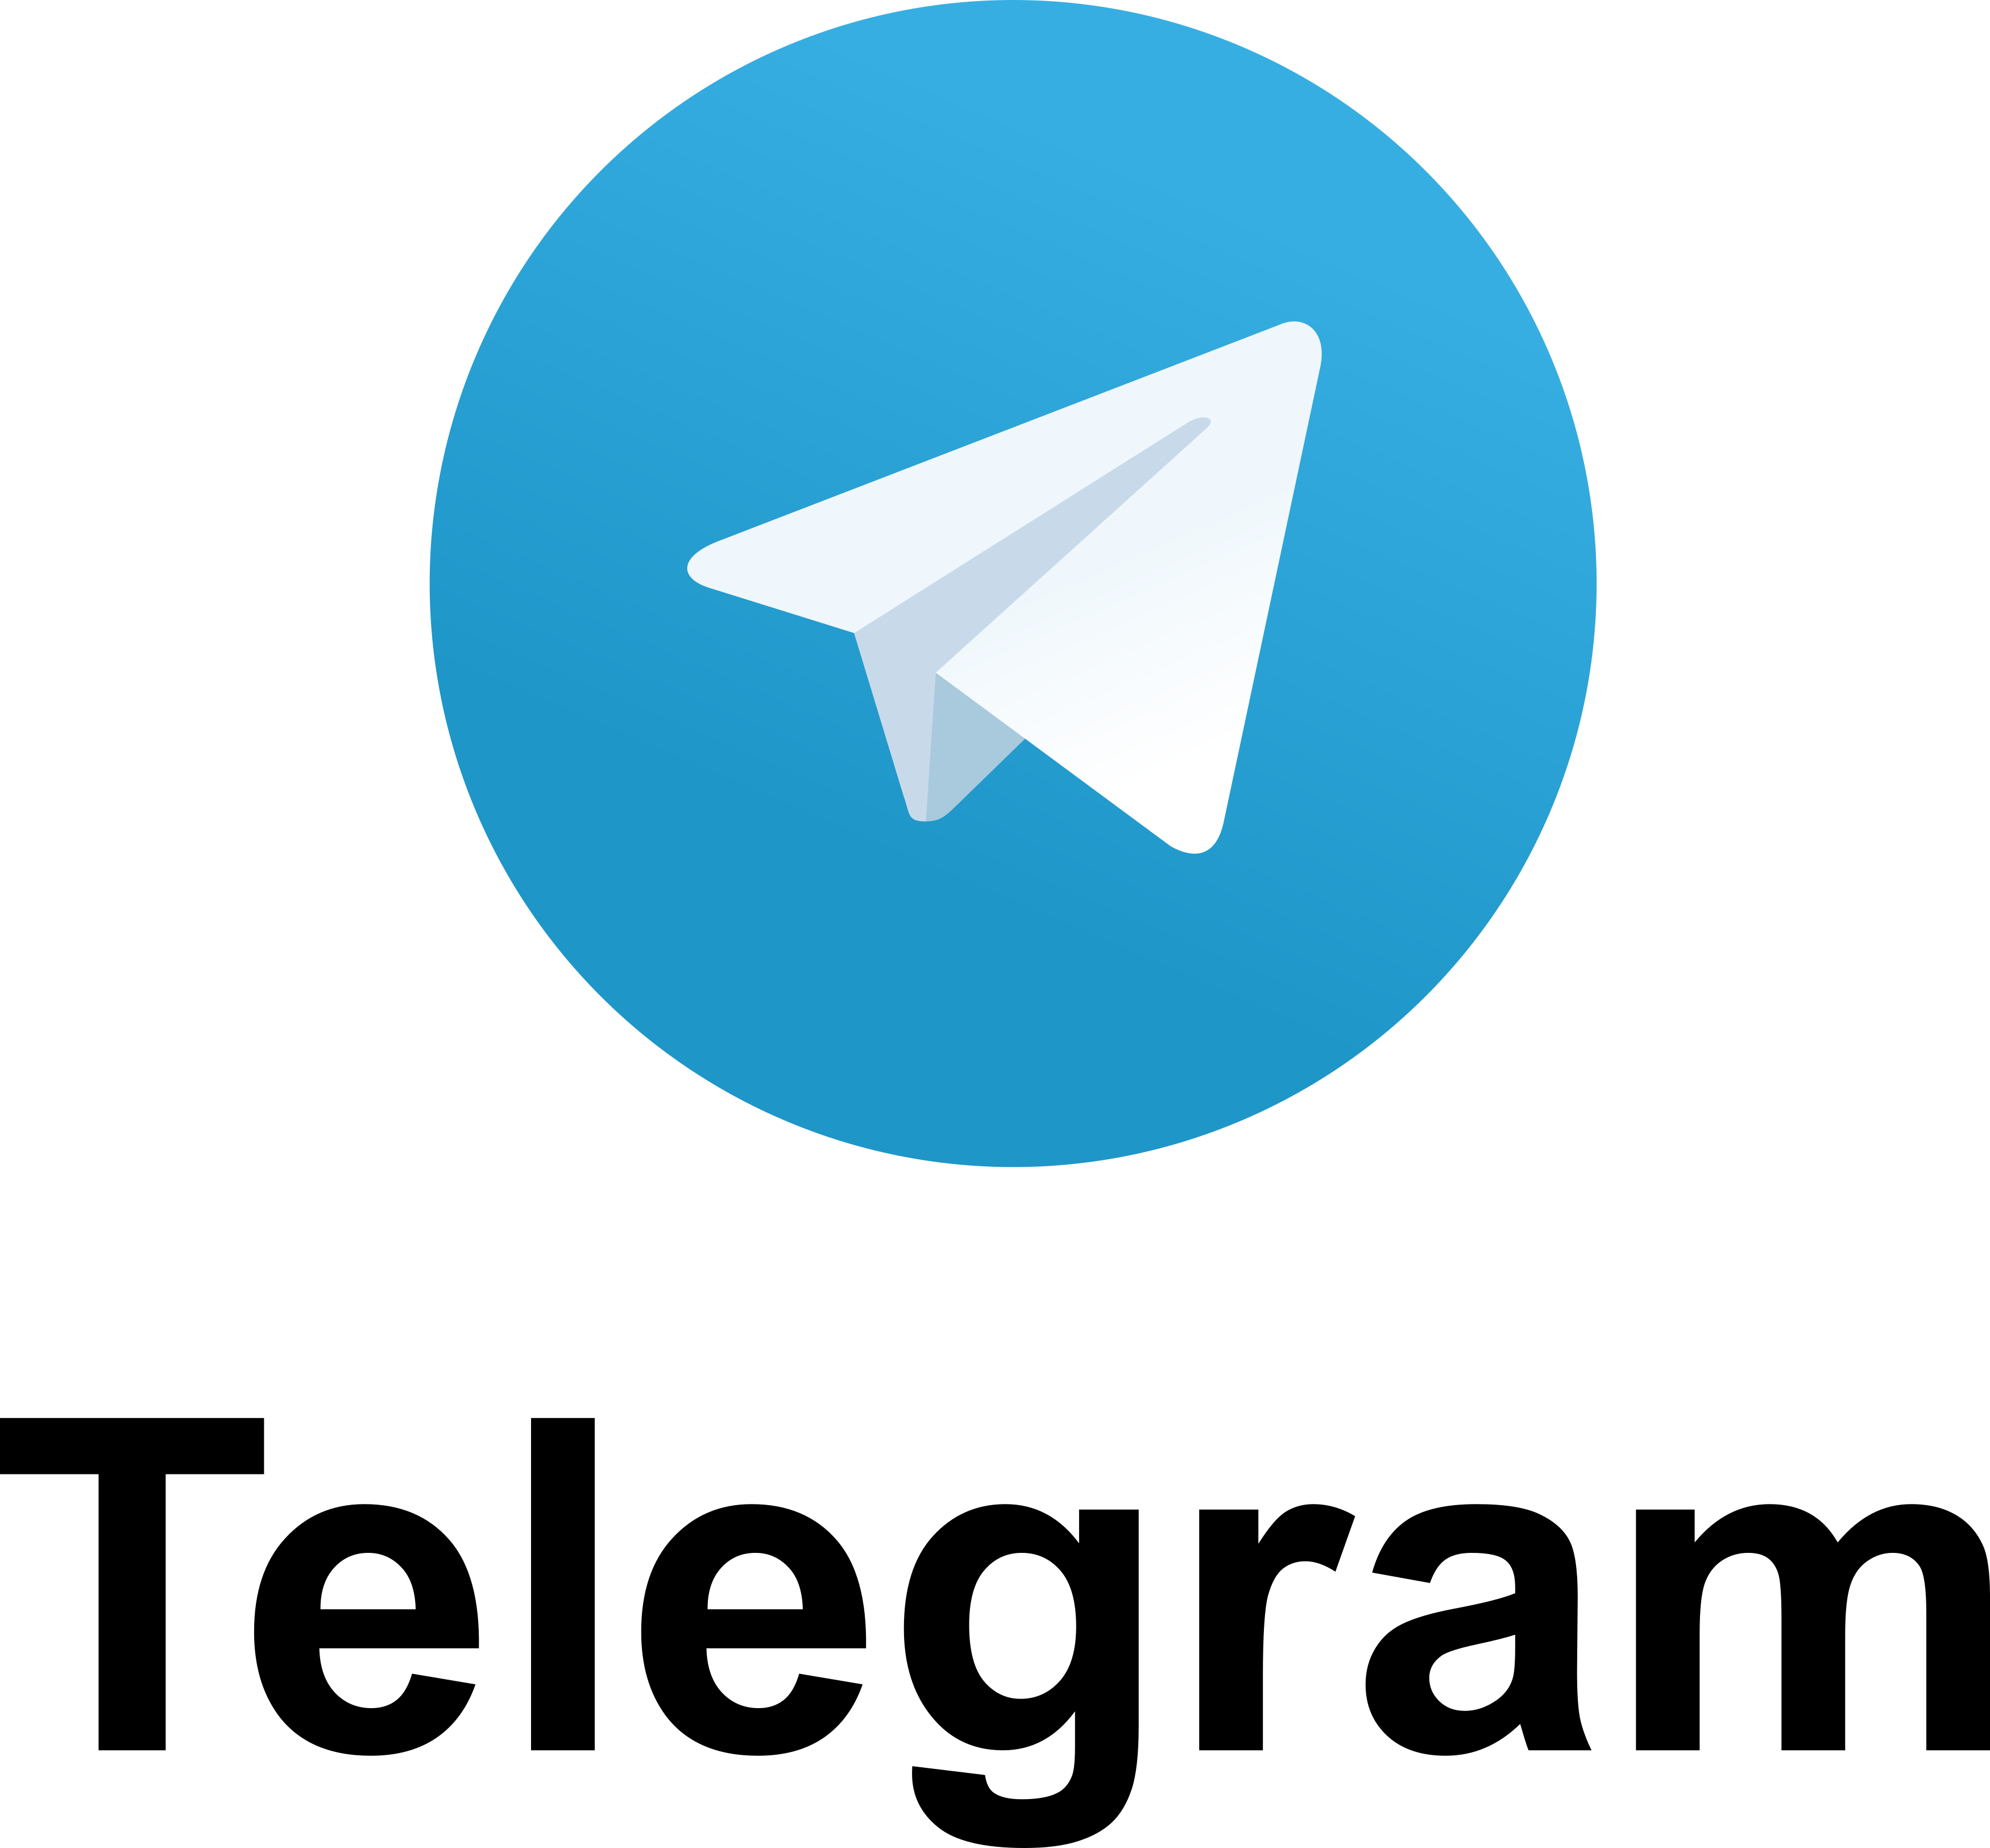 Telegram PNG images free download.